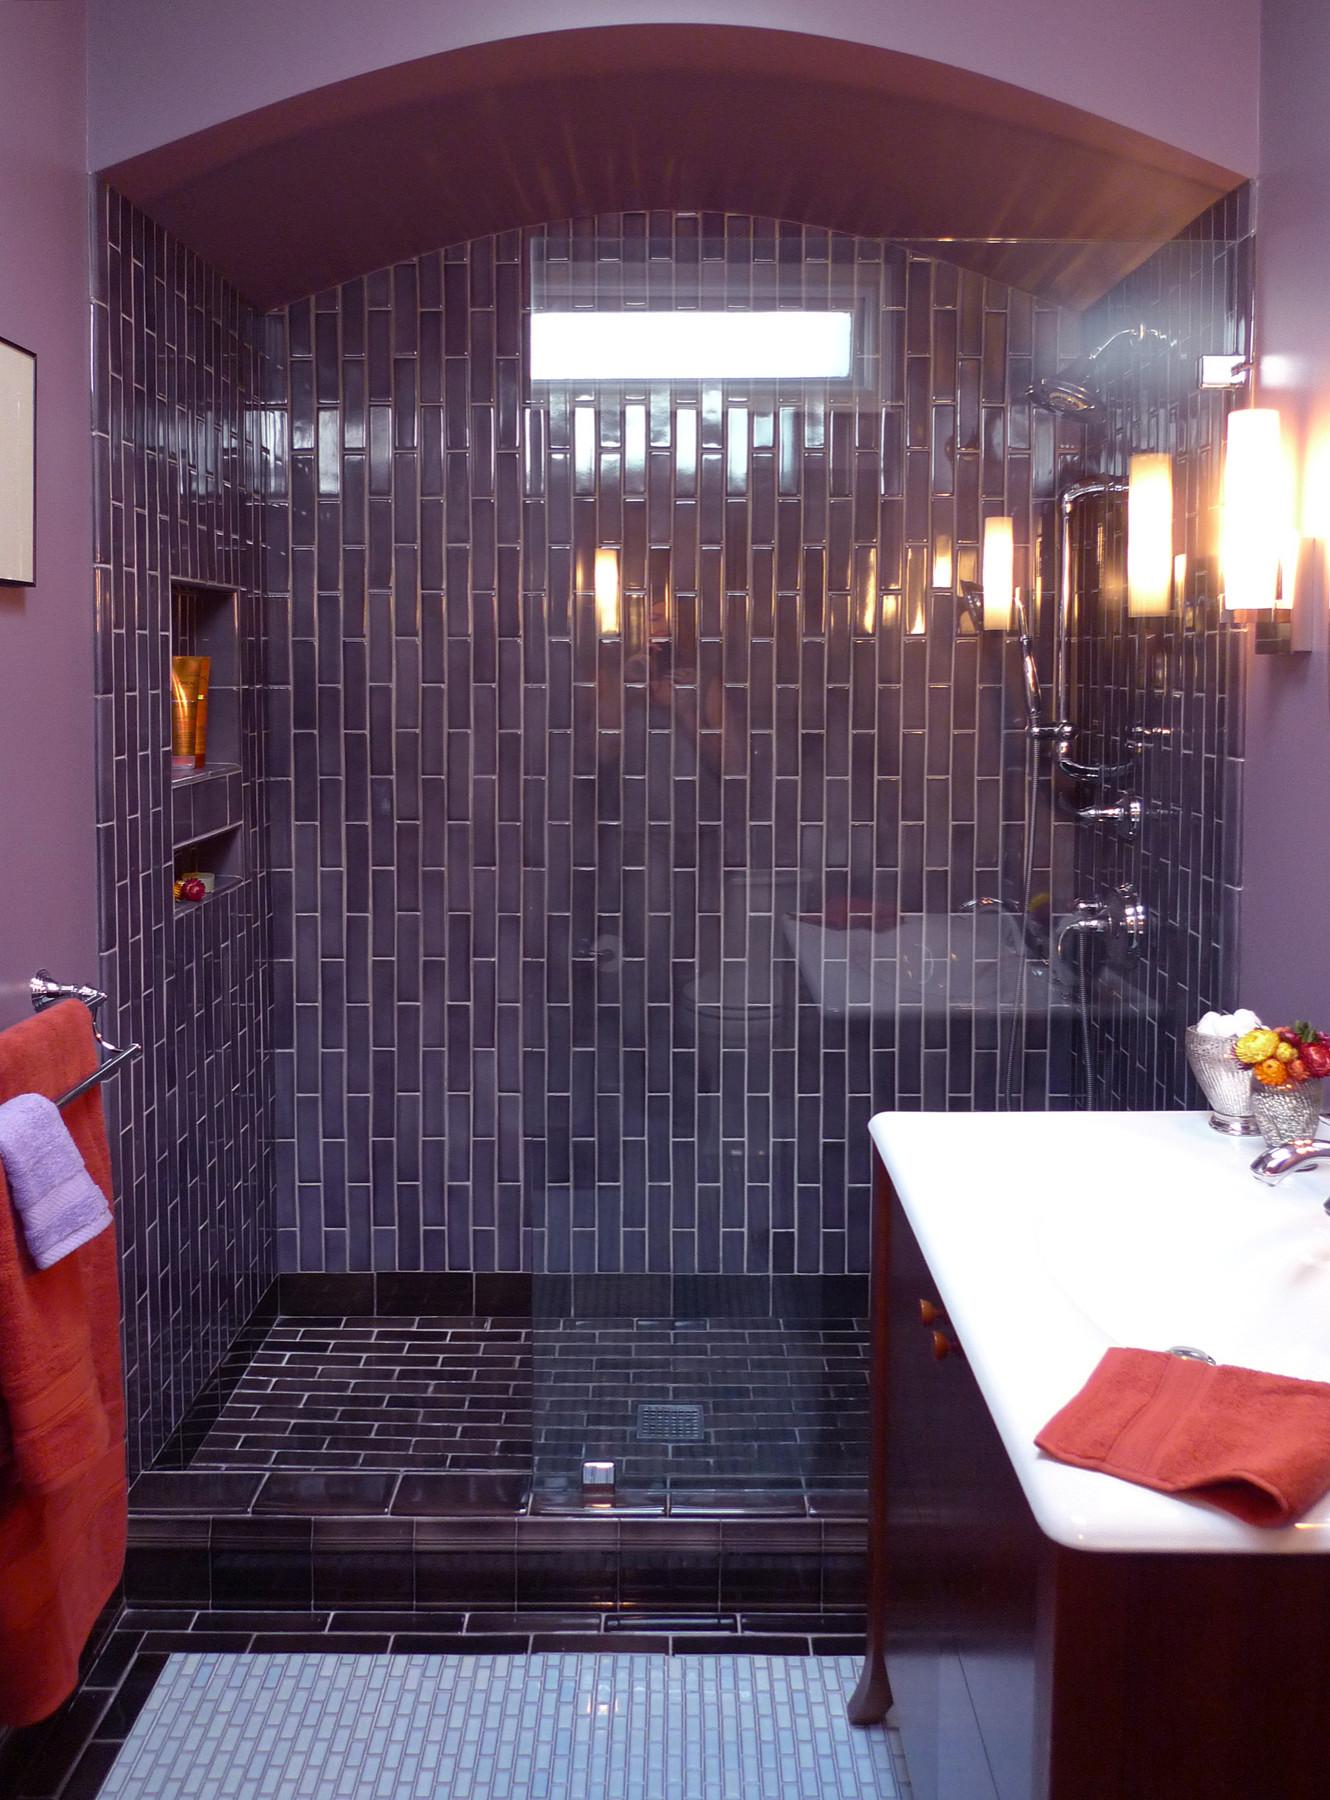 75 Beautiful Purple Bathroom Pictures, Purple Bathroom Decorating Ideas Pictures